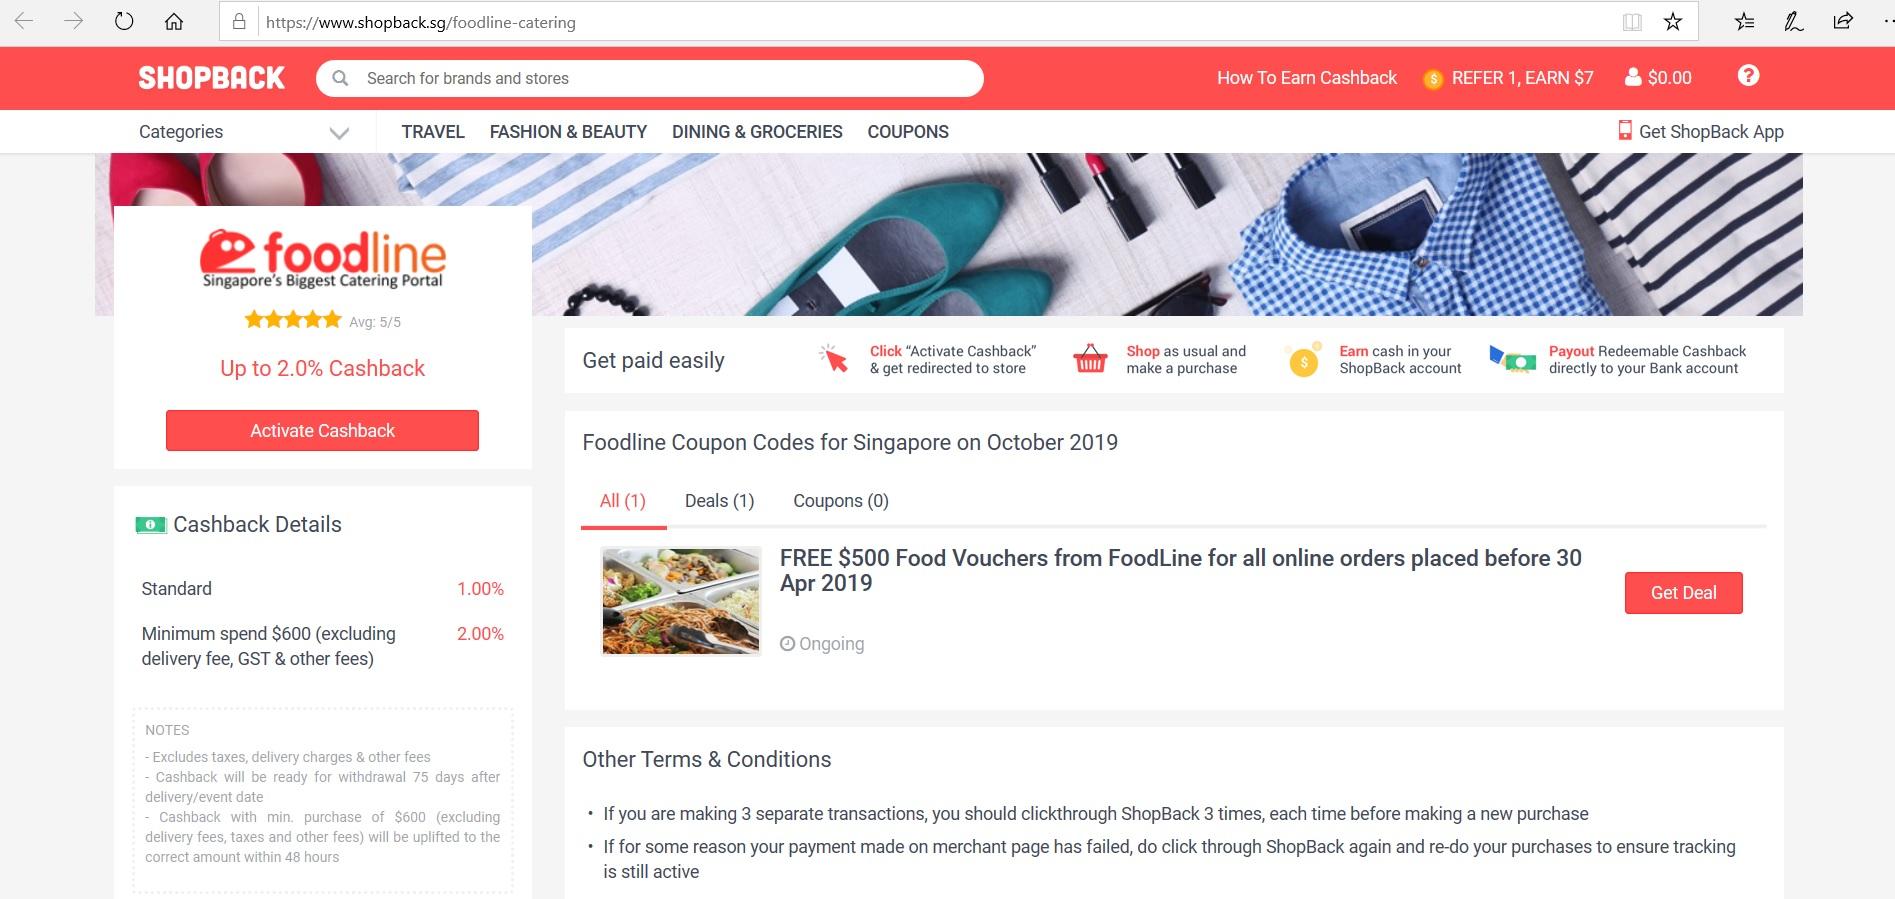 FoodLine page on ShopBack.